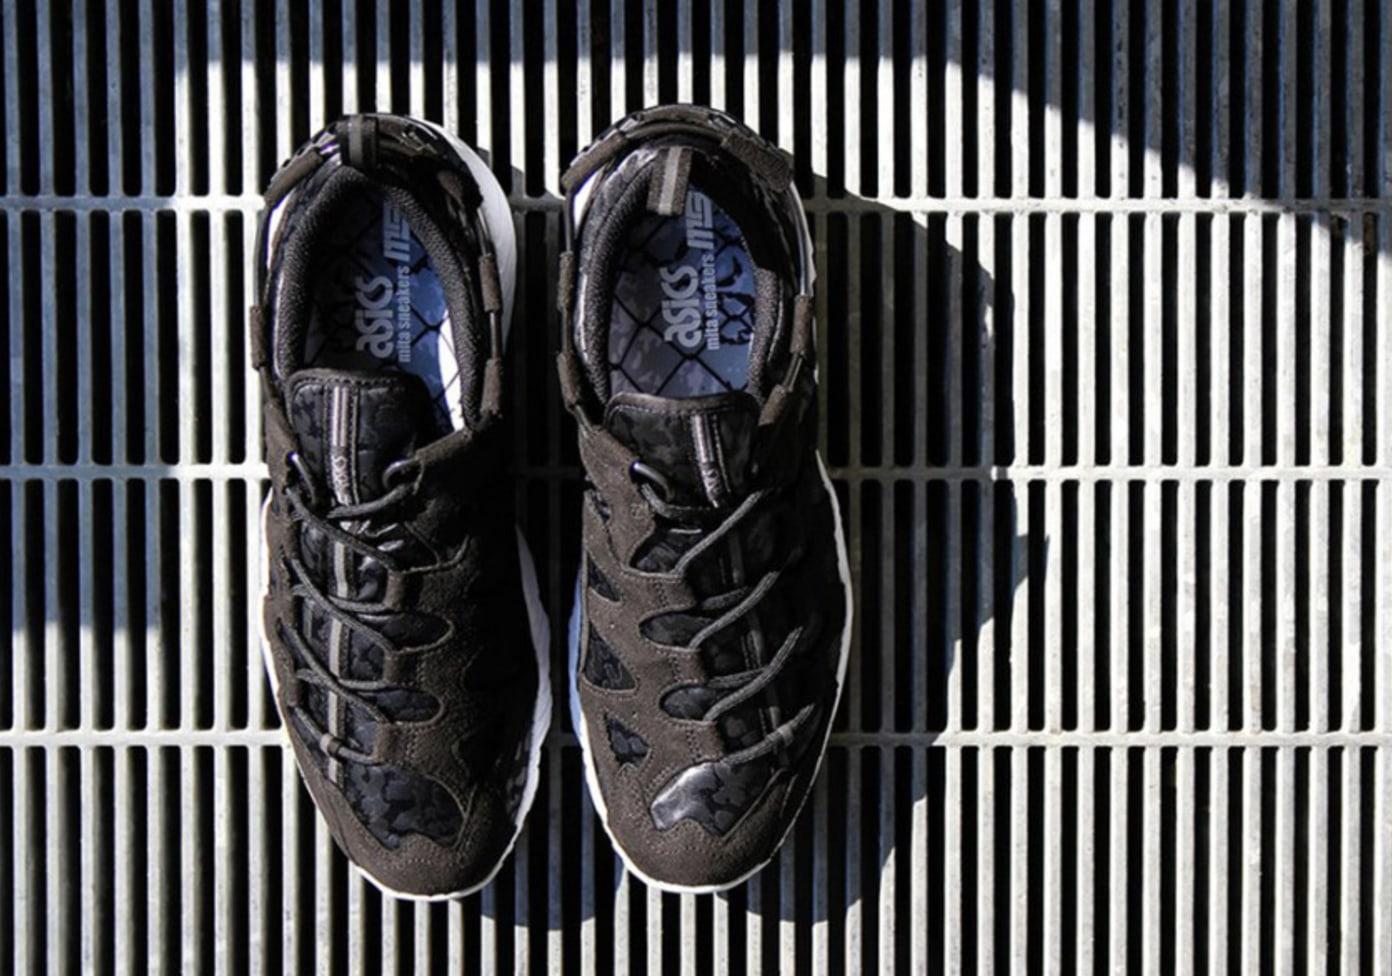 exposición Periodo perioperatorio no relacionado  mita sneakers x Asics Gel-Mai | Shelflife